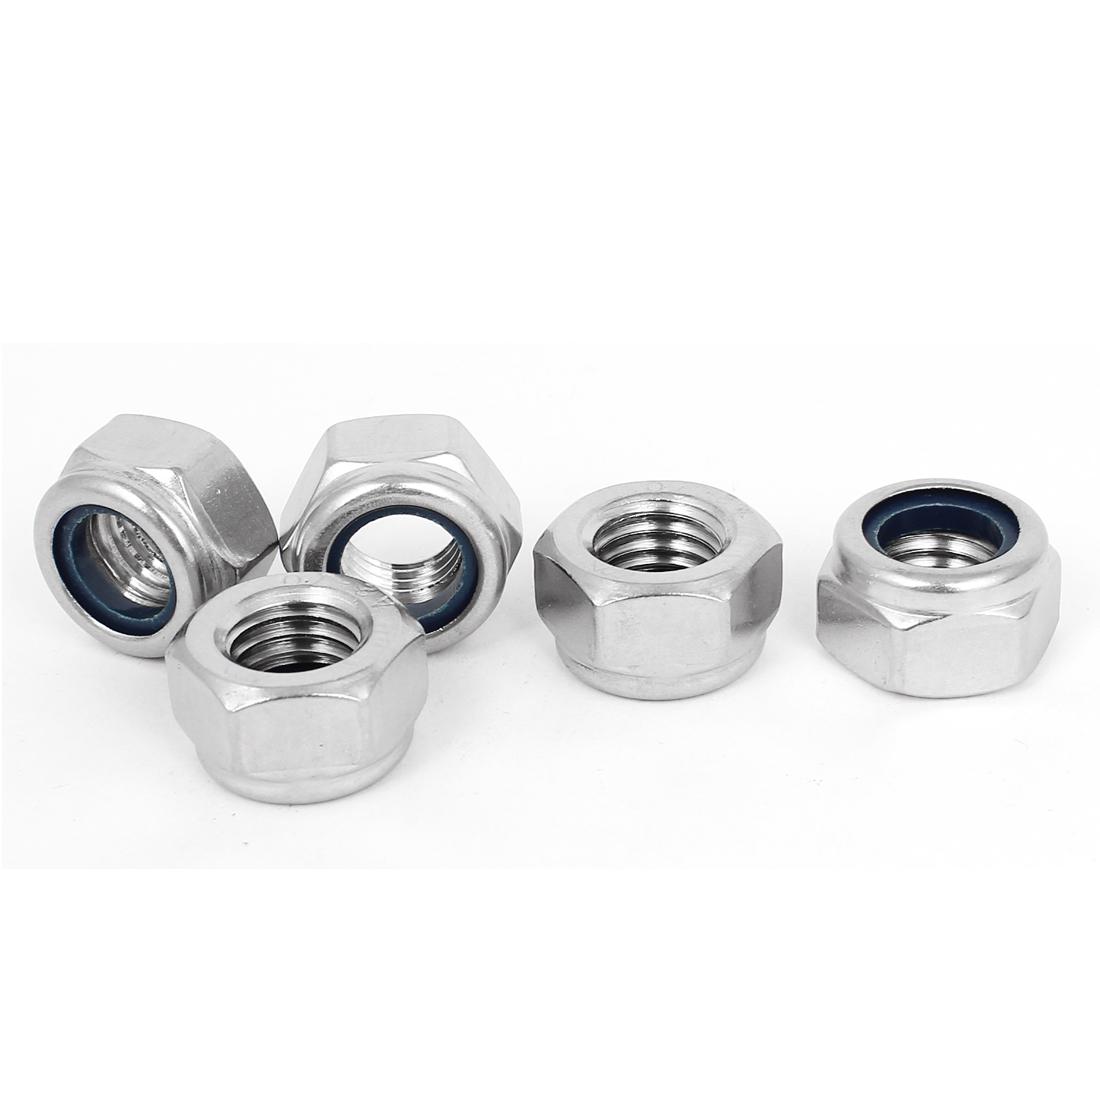 M14x2mm 304 Stainless Steel Nylock Self-Locking Nylon Insert Hex Lock Nuts 5pcs